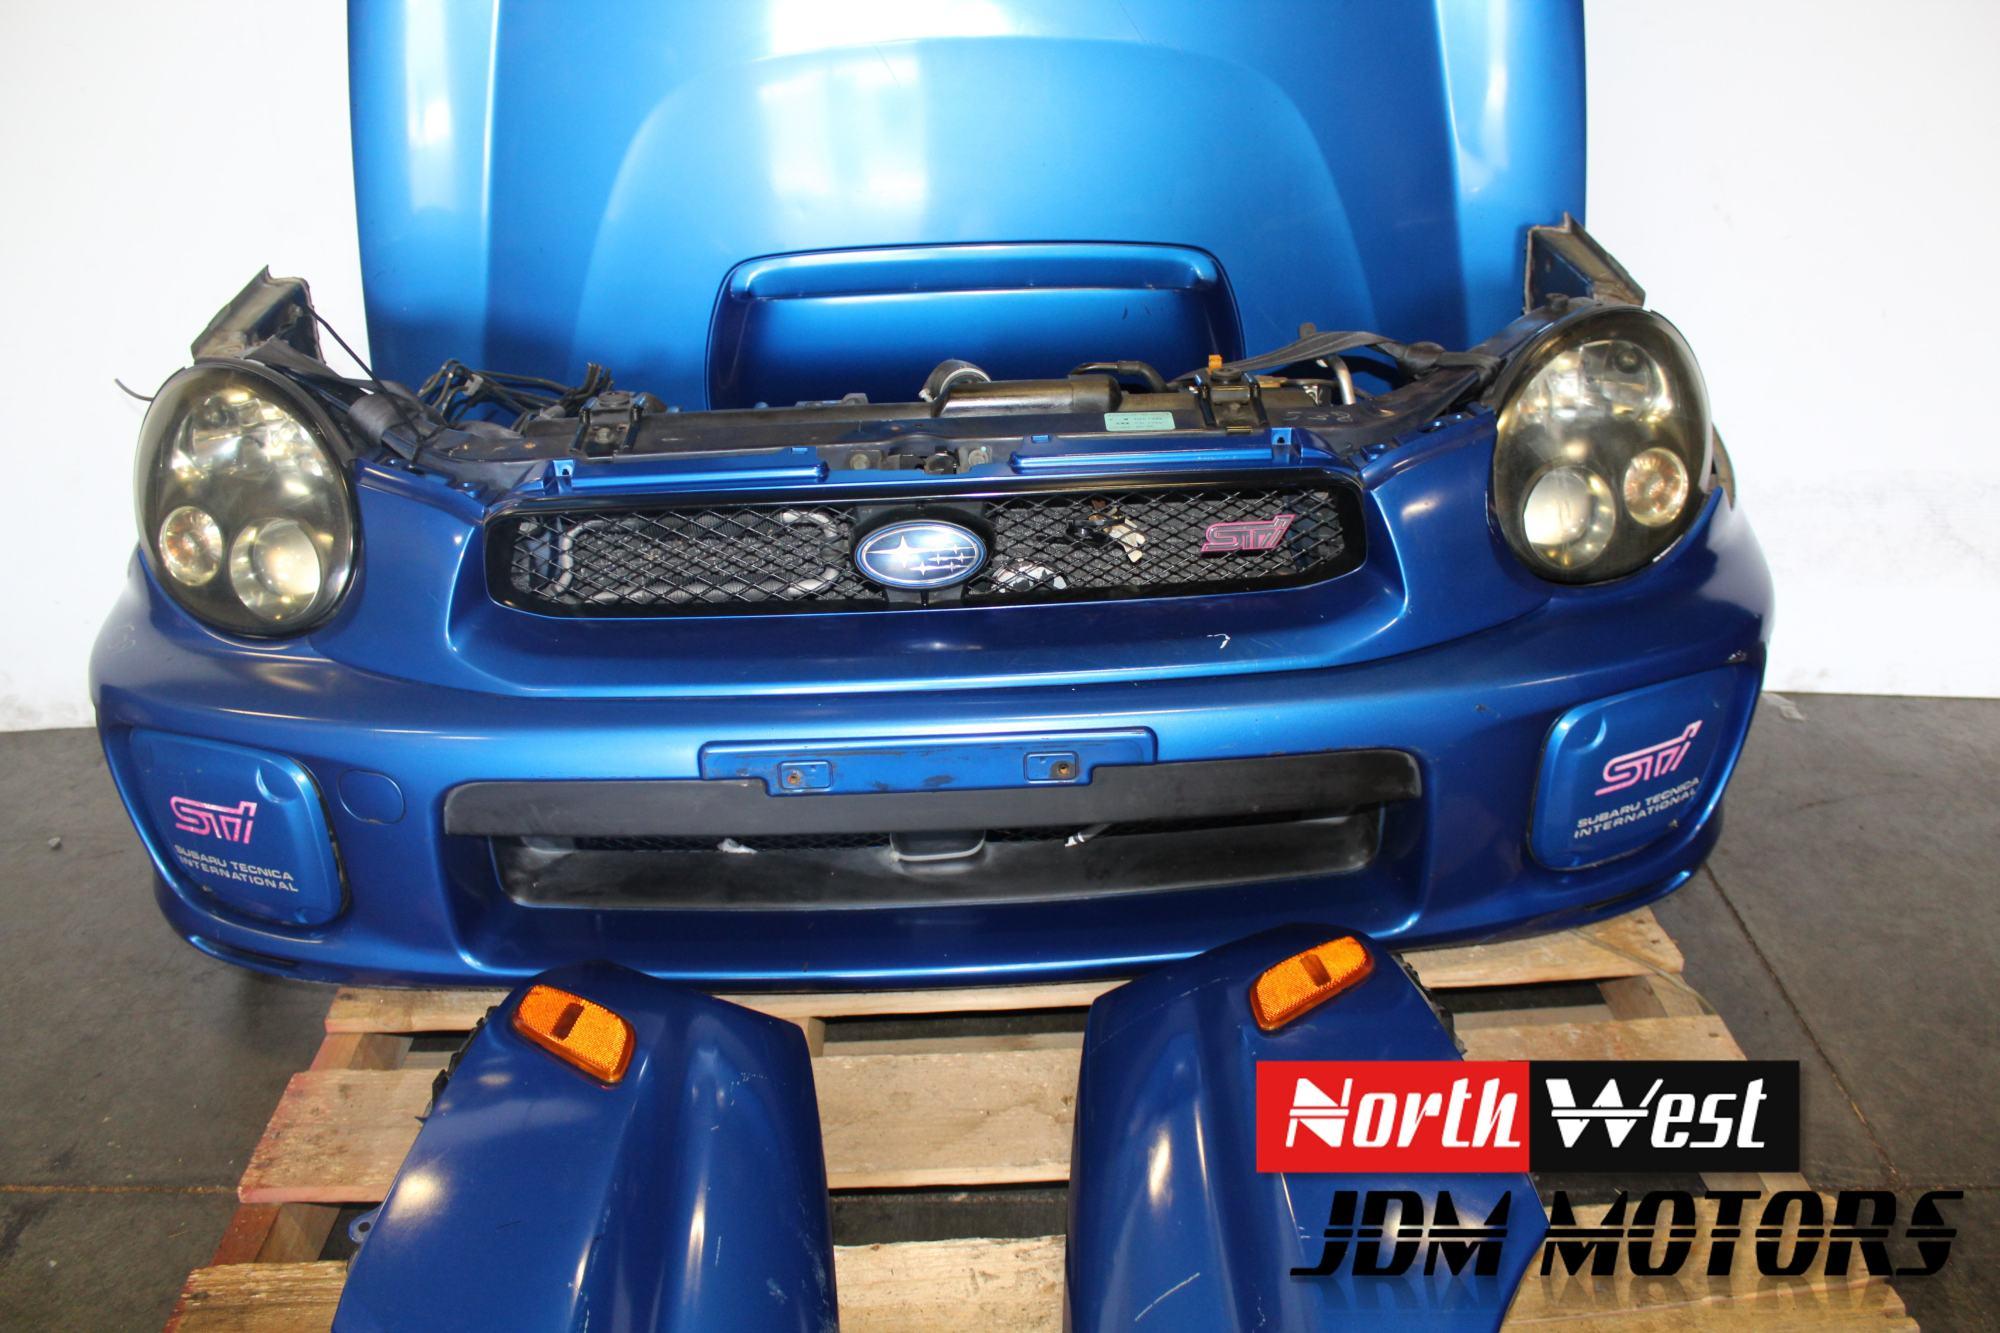 hight resolution of 2002 2003 jdm subaru impreza sti bugeye front end conversion nose cut sedan v7